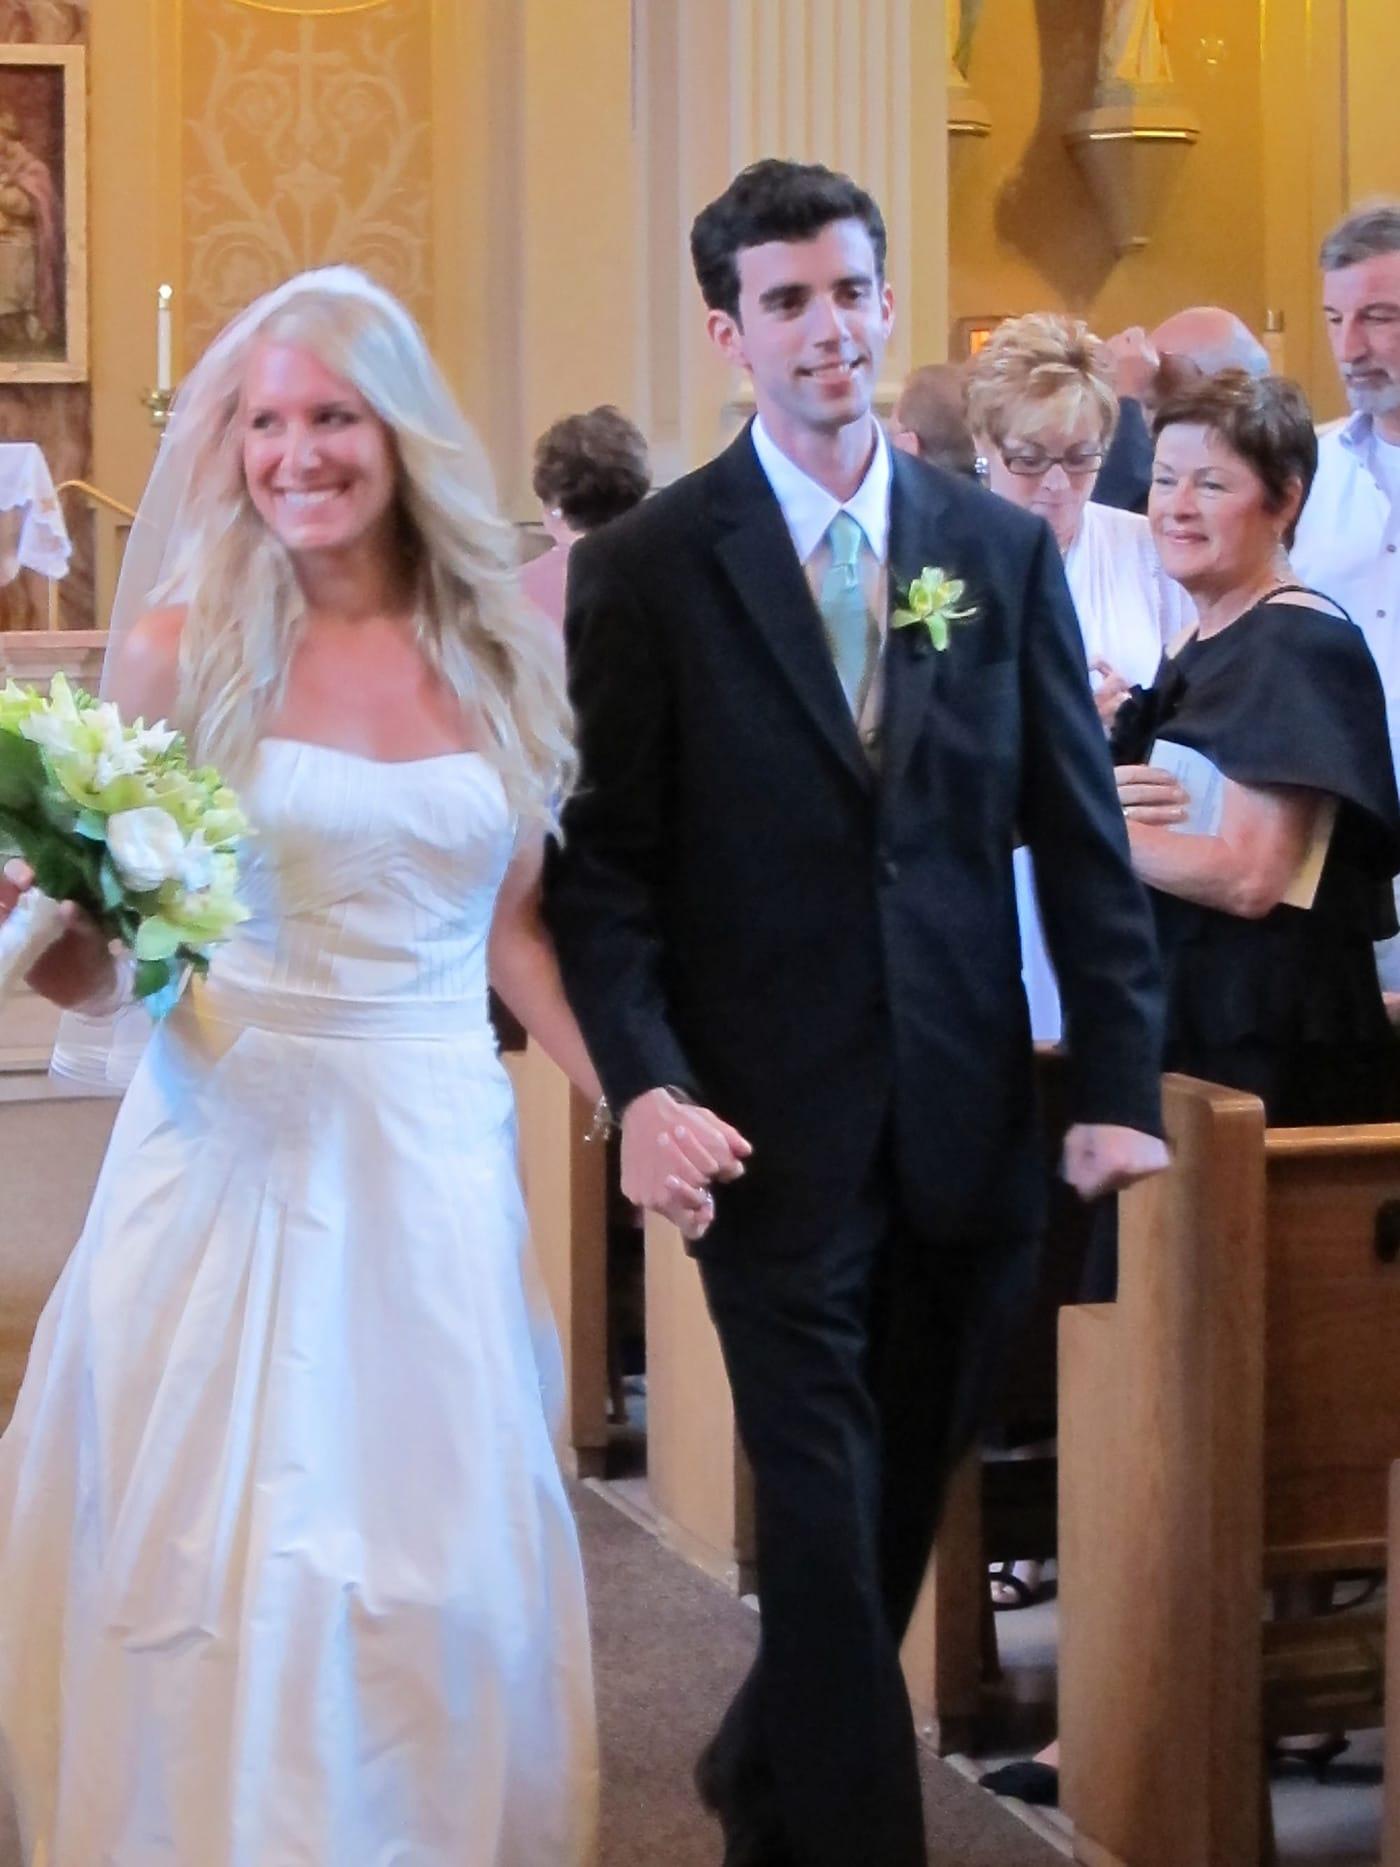 Sheila and John's wedding